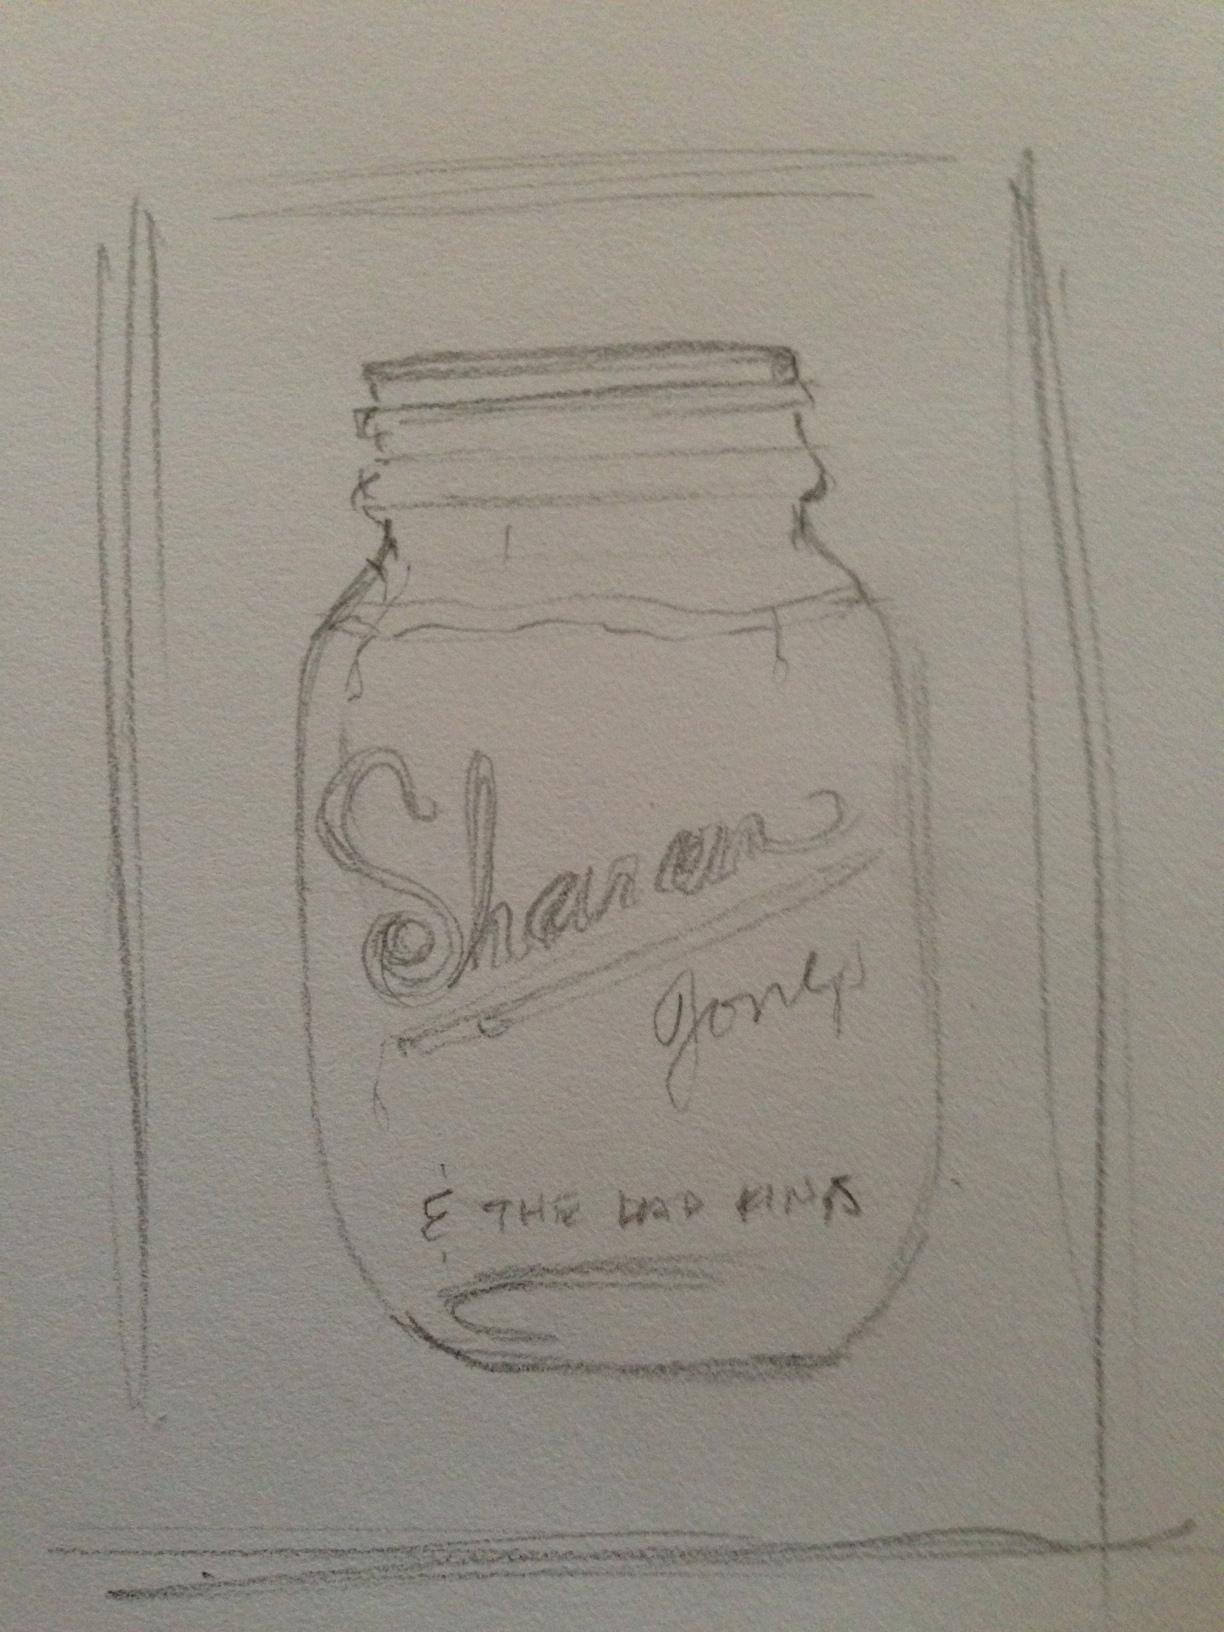 Sharon Jones and the Dap Kings - image 1 - student project